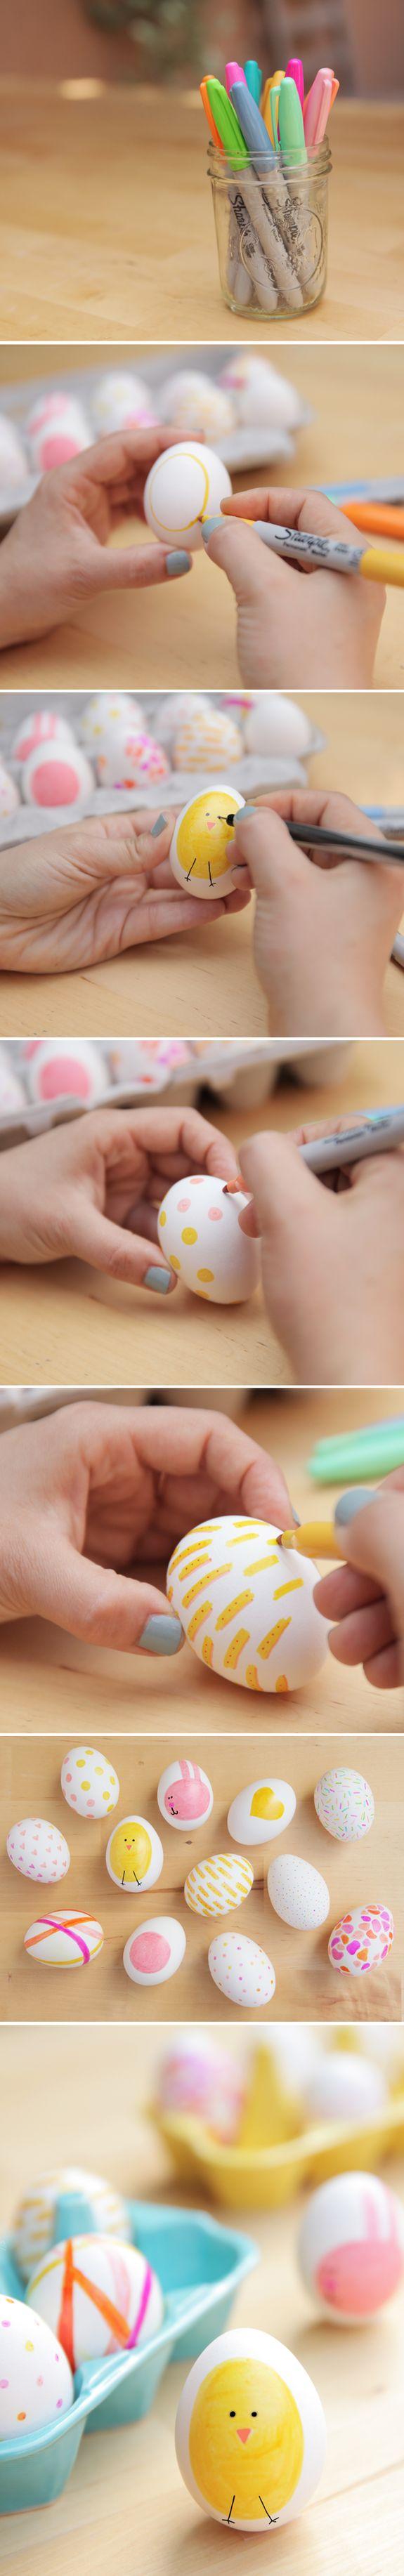 Easy Easter Craft: Sharpie Eggs!